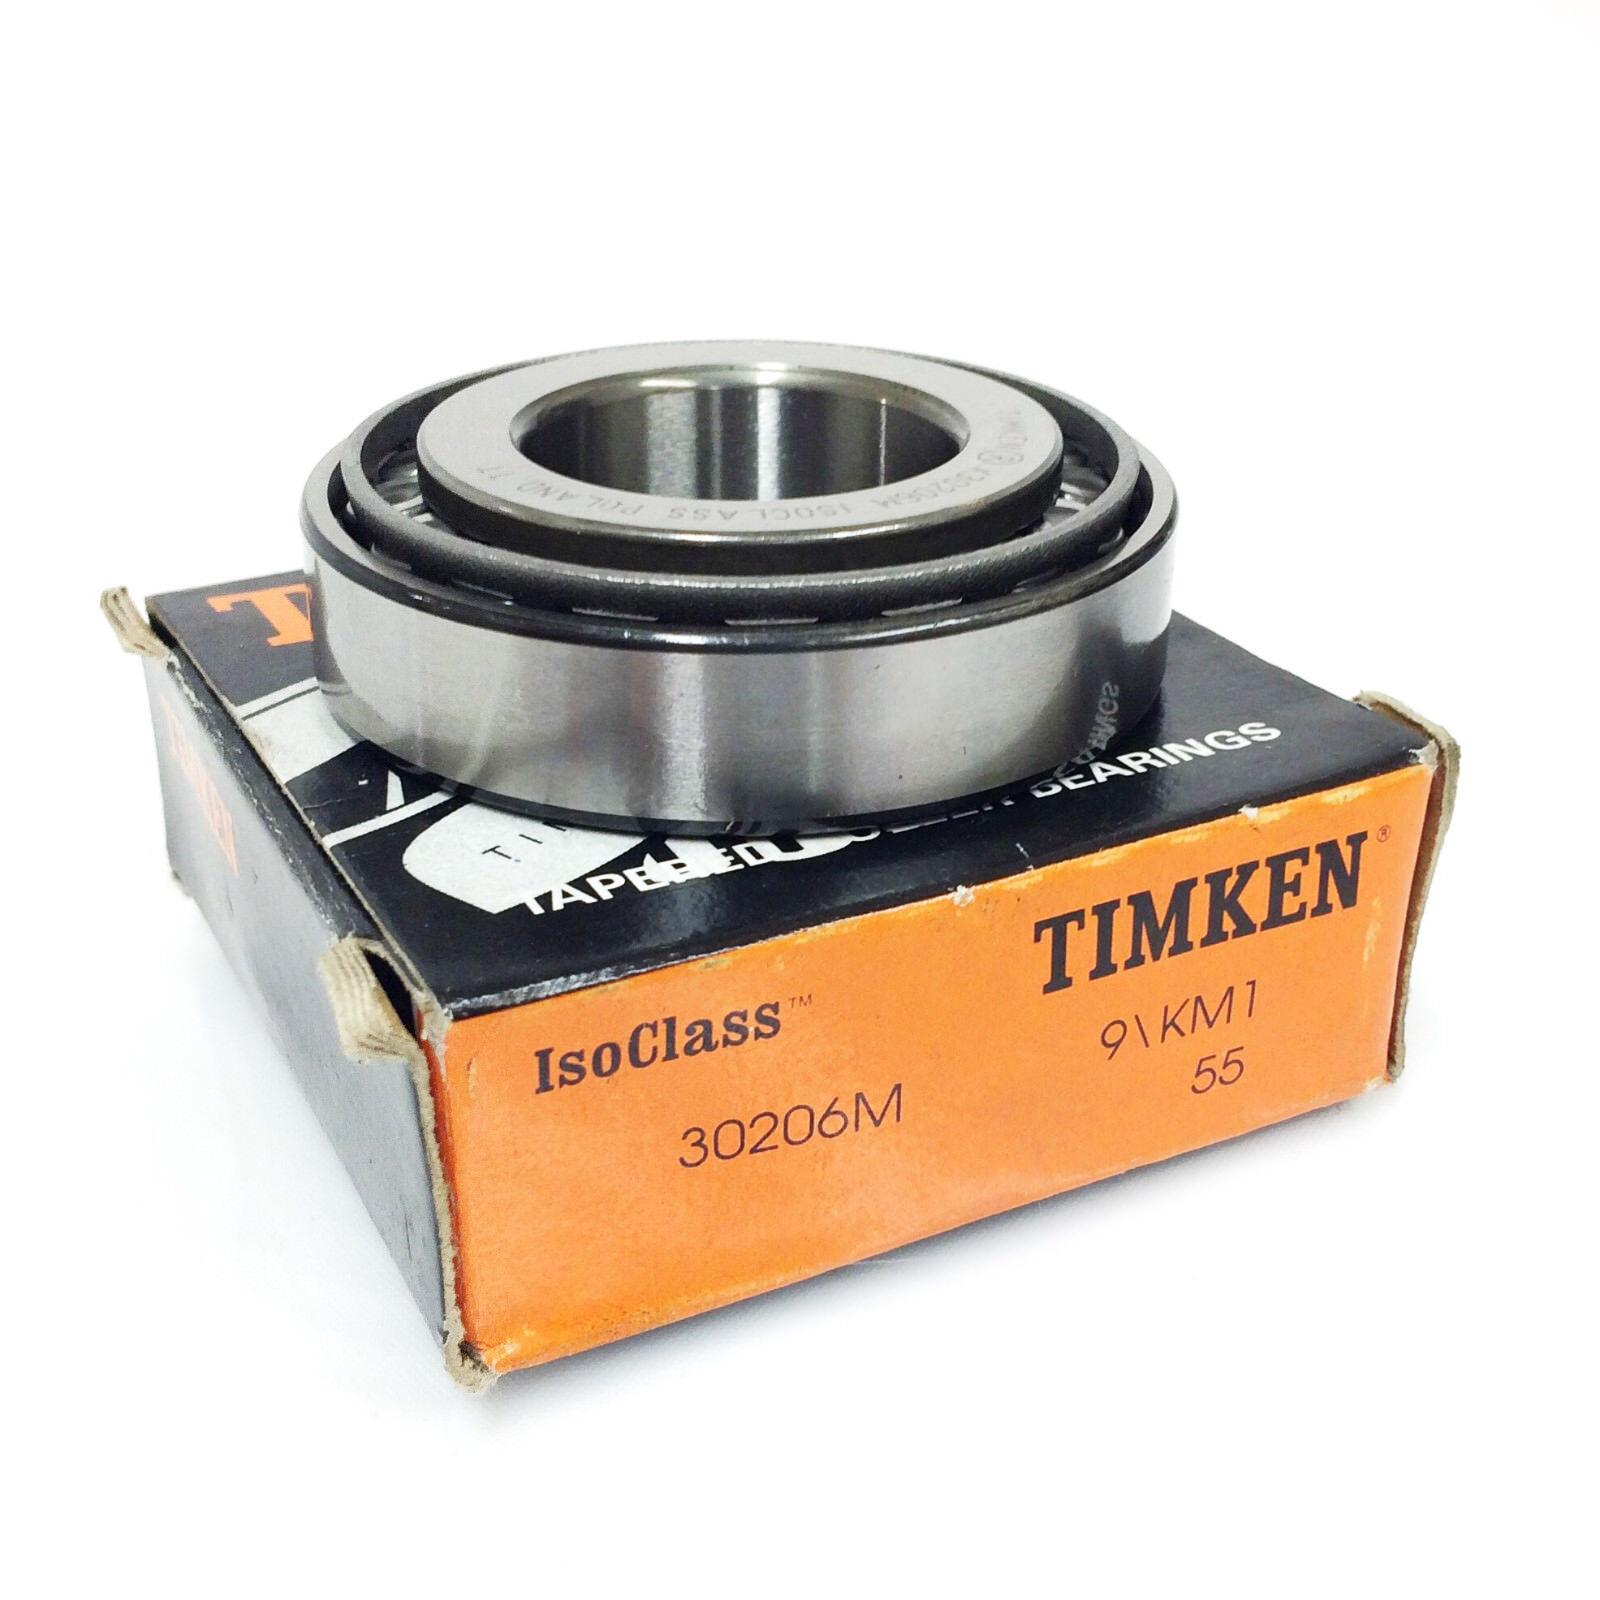 30206M Rodamiento Timken 9//KM1-55